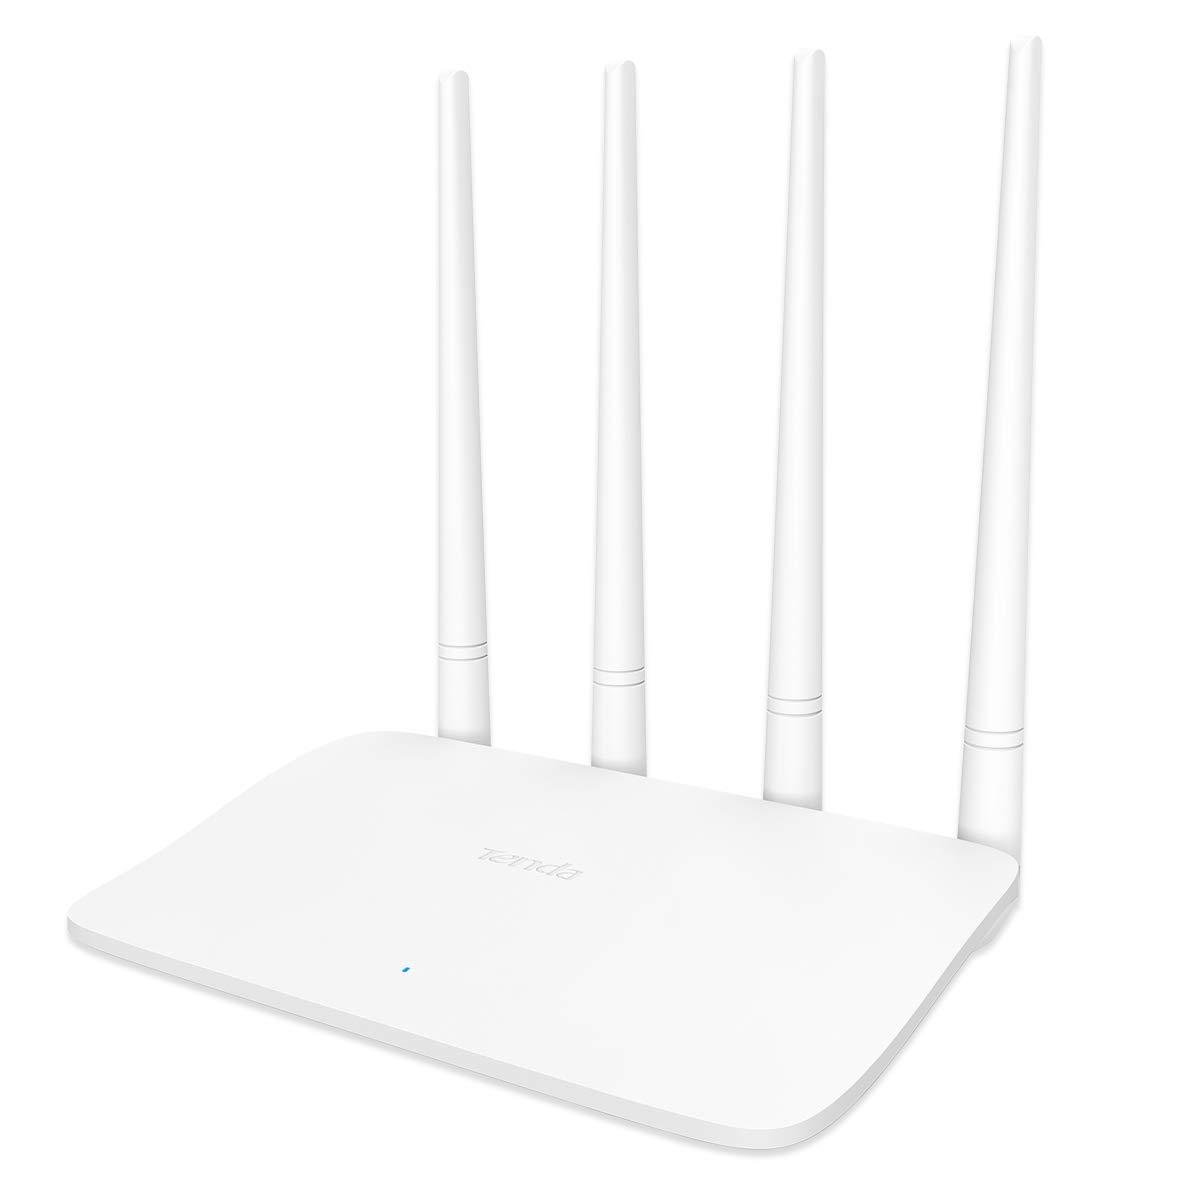 Tenda F6 Wireless N300 Easy Setup Wi-Fi Router 300 (White, Not a Modem)